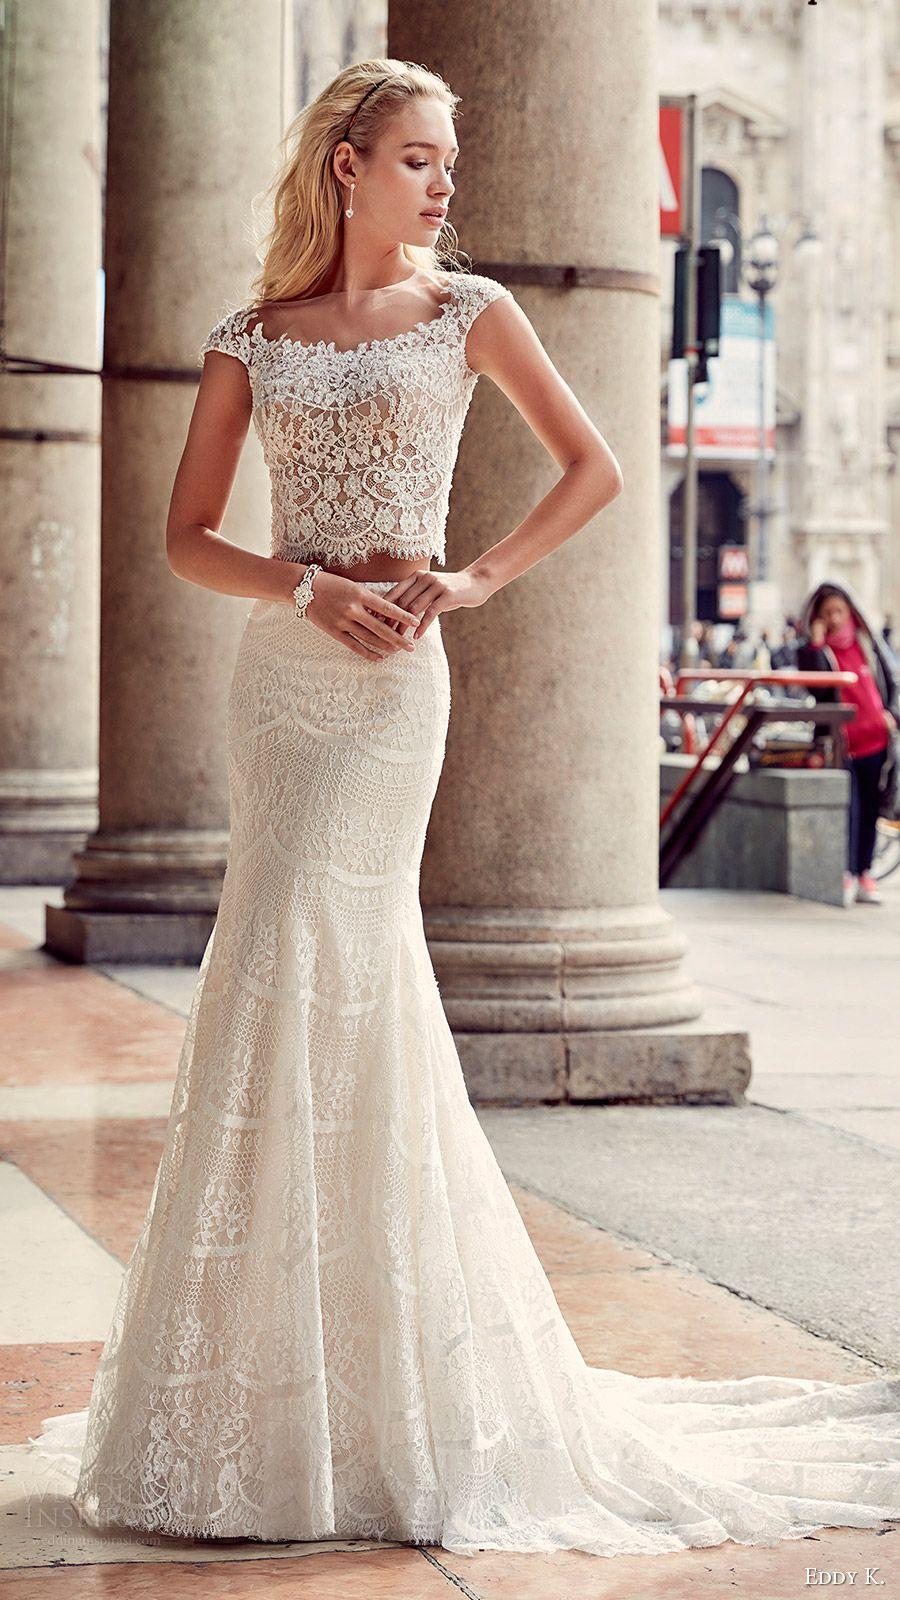 Eddy k wedding dresses u milano bridal collection pinterest